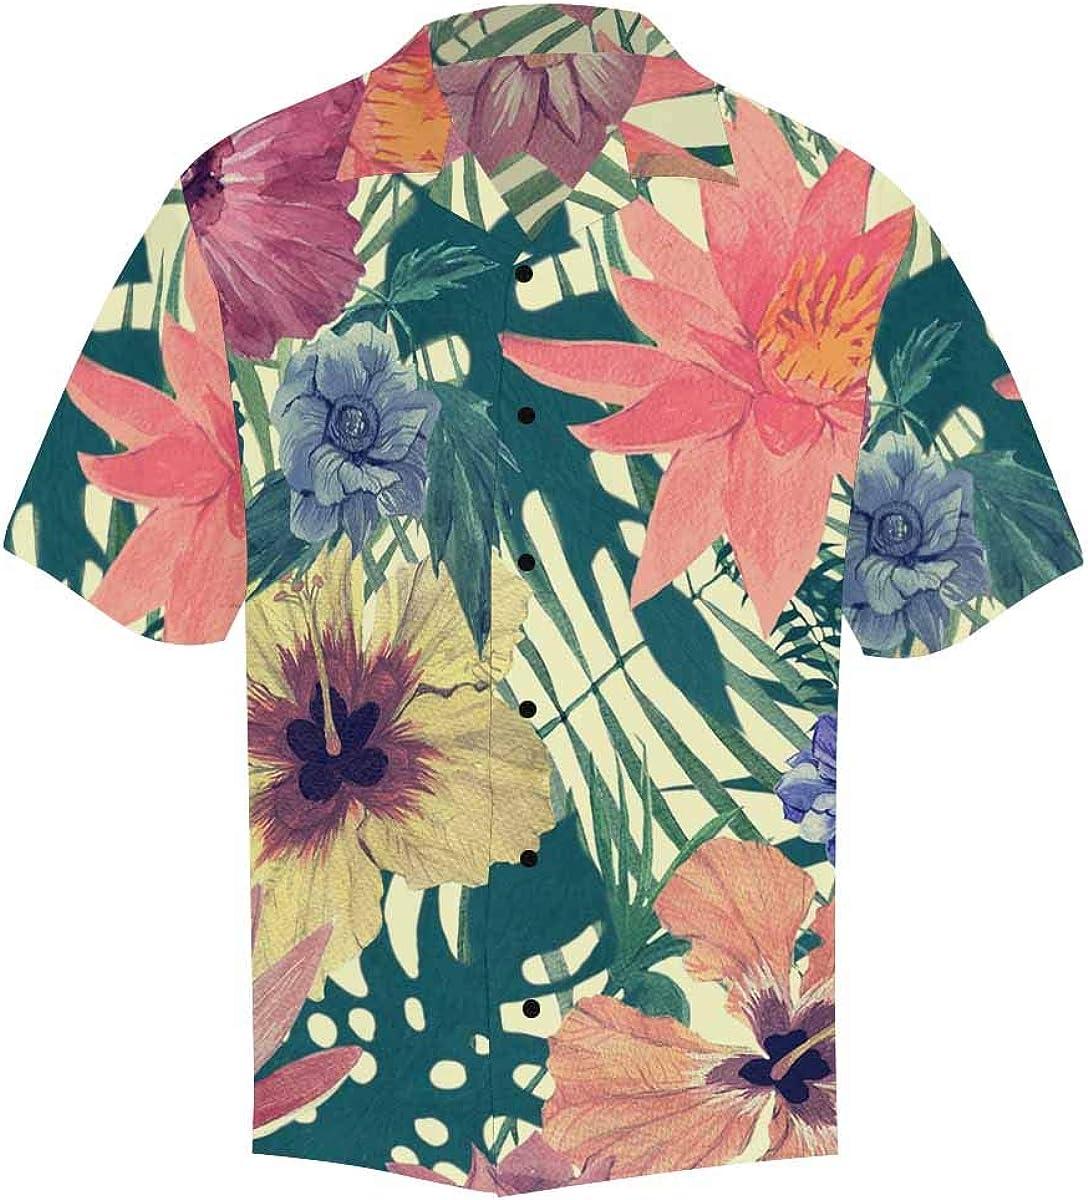 InterestPrint Men's Casual Button Down Short Sleeve Vintage Tropical Floral Hawaiian Shirt (S-5XL)